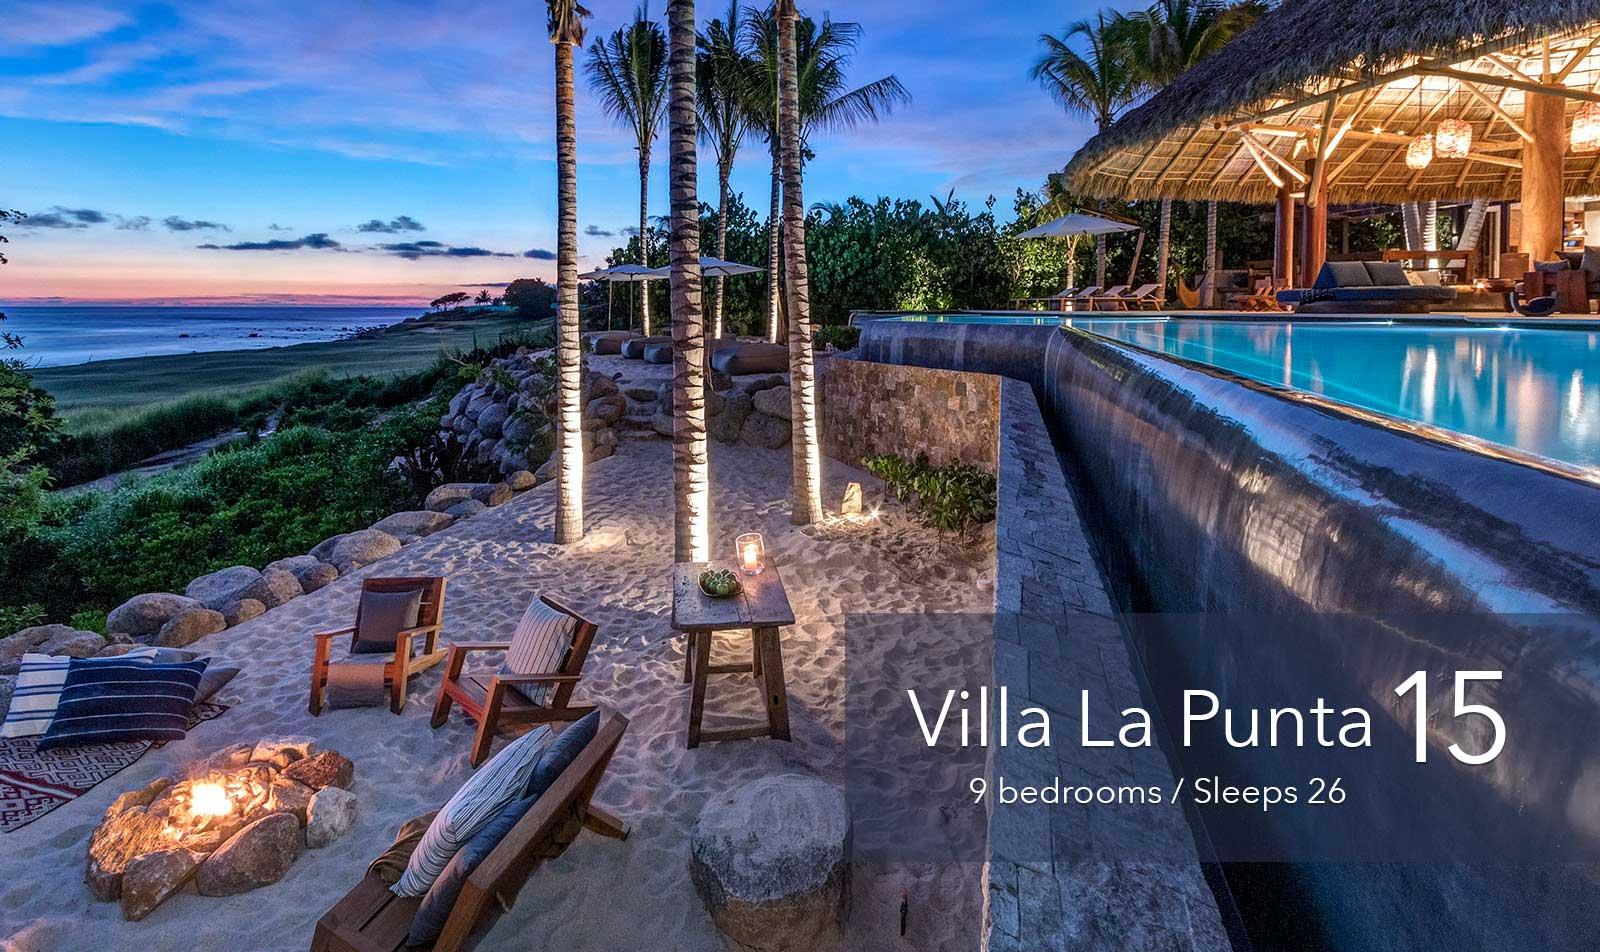 Villa La Punta 15 - Large Ultra luxury vacation rental estate villa at the exclusive Punta Mita Resort, Riviera Nayarit, Mexico